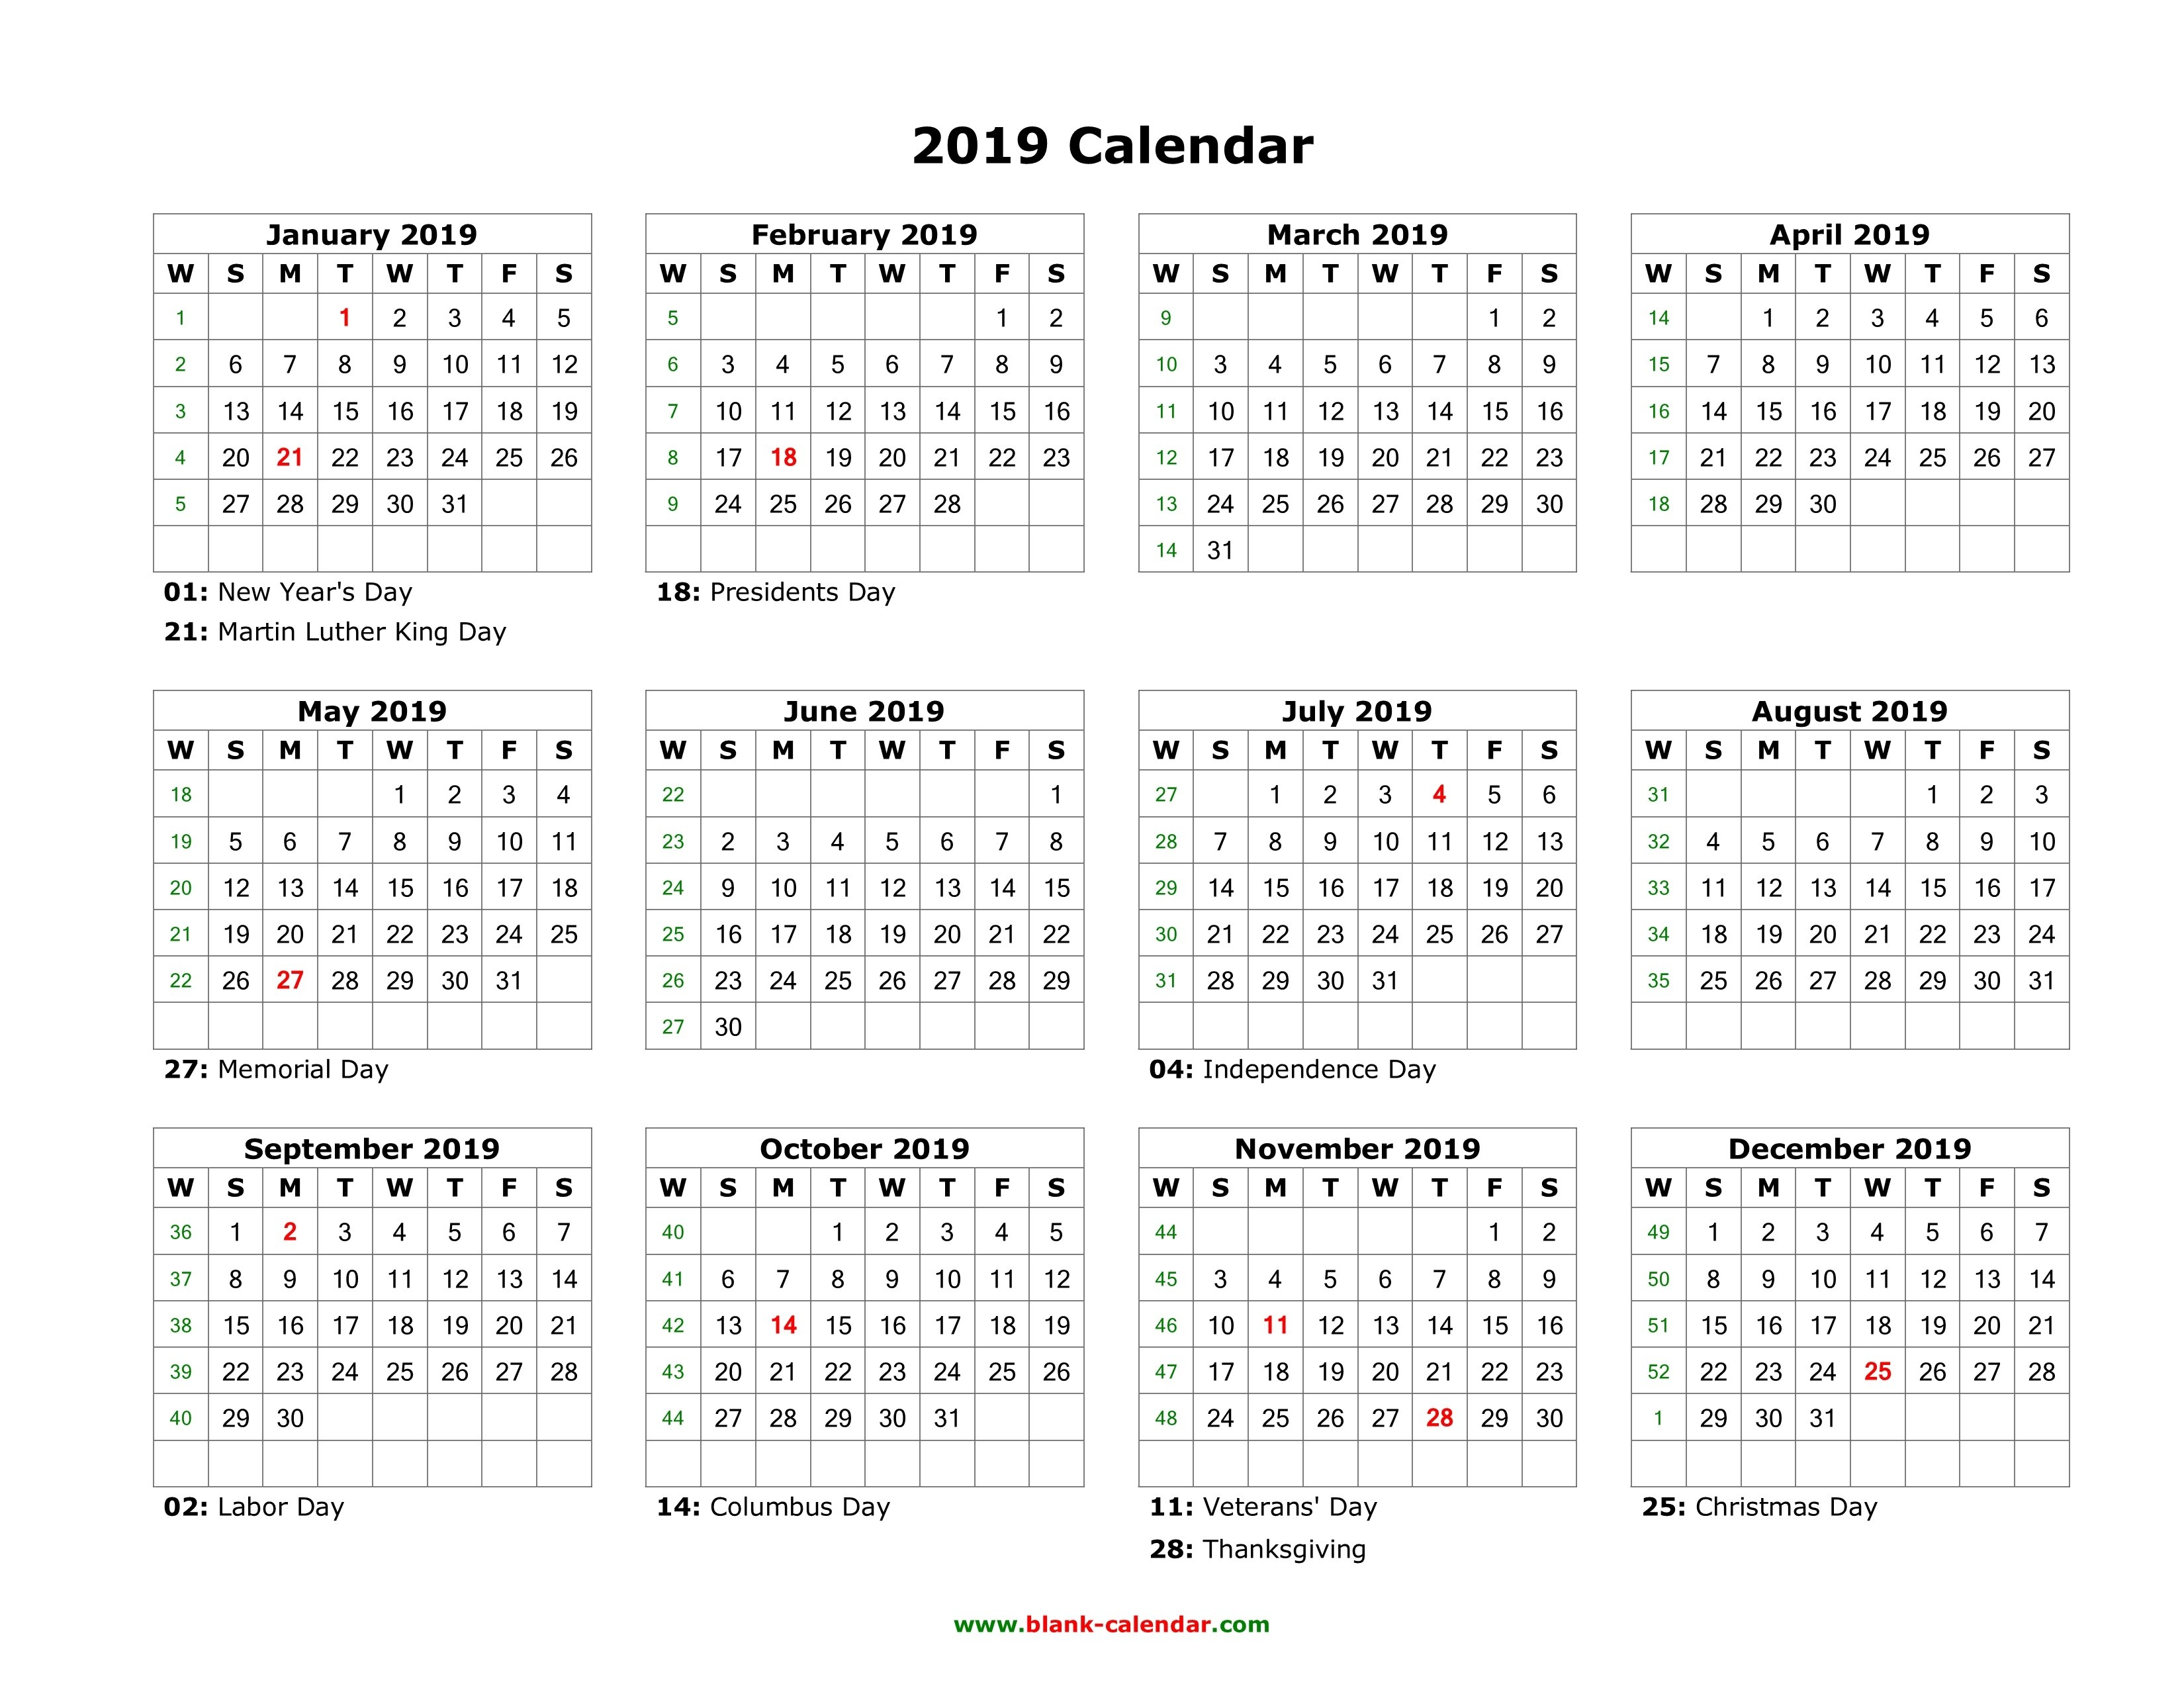 Blank Calendar 2019   Free Download Calendar Templates Calendar 2019 Microsoft